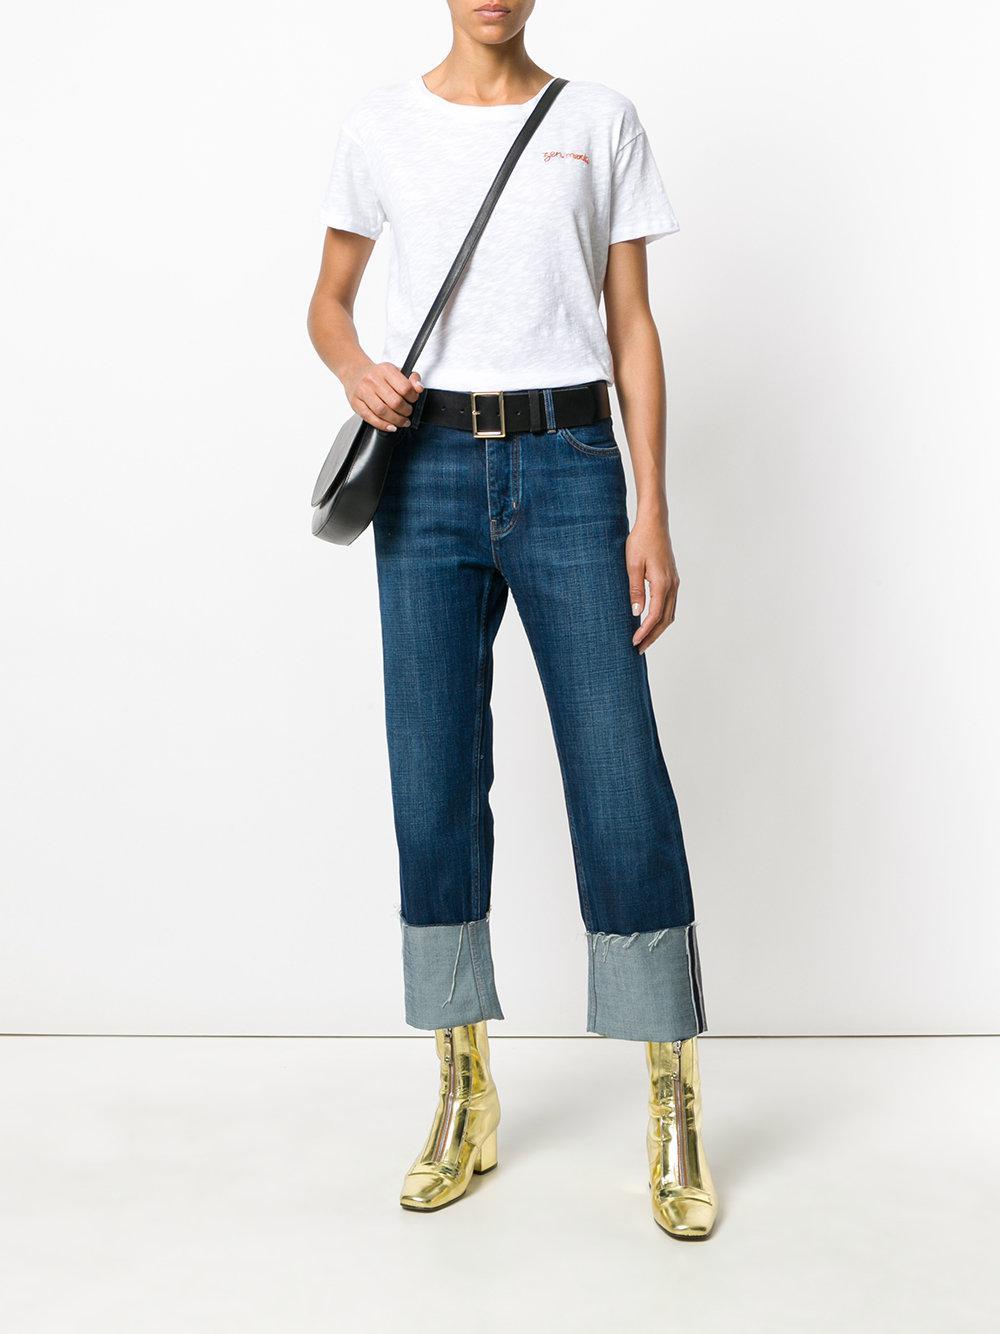 M.i.h Jeans Denim Phoebe Customised Jeans in Blue